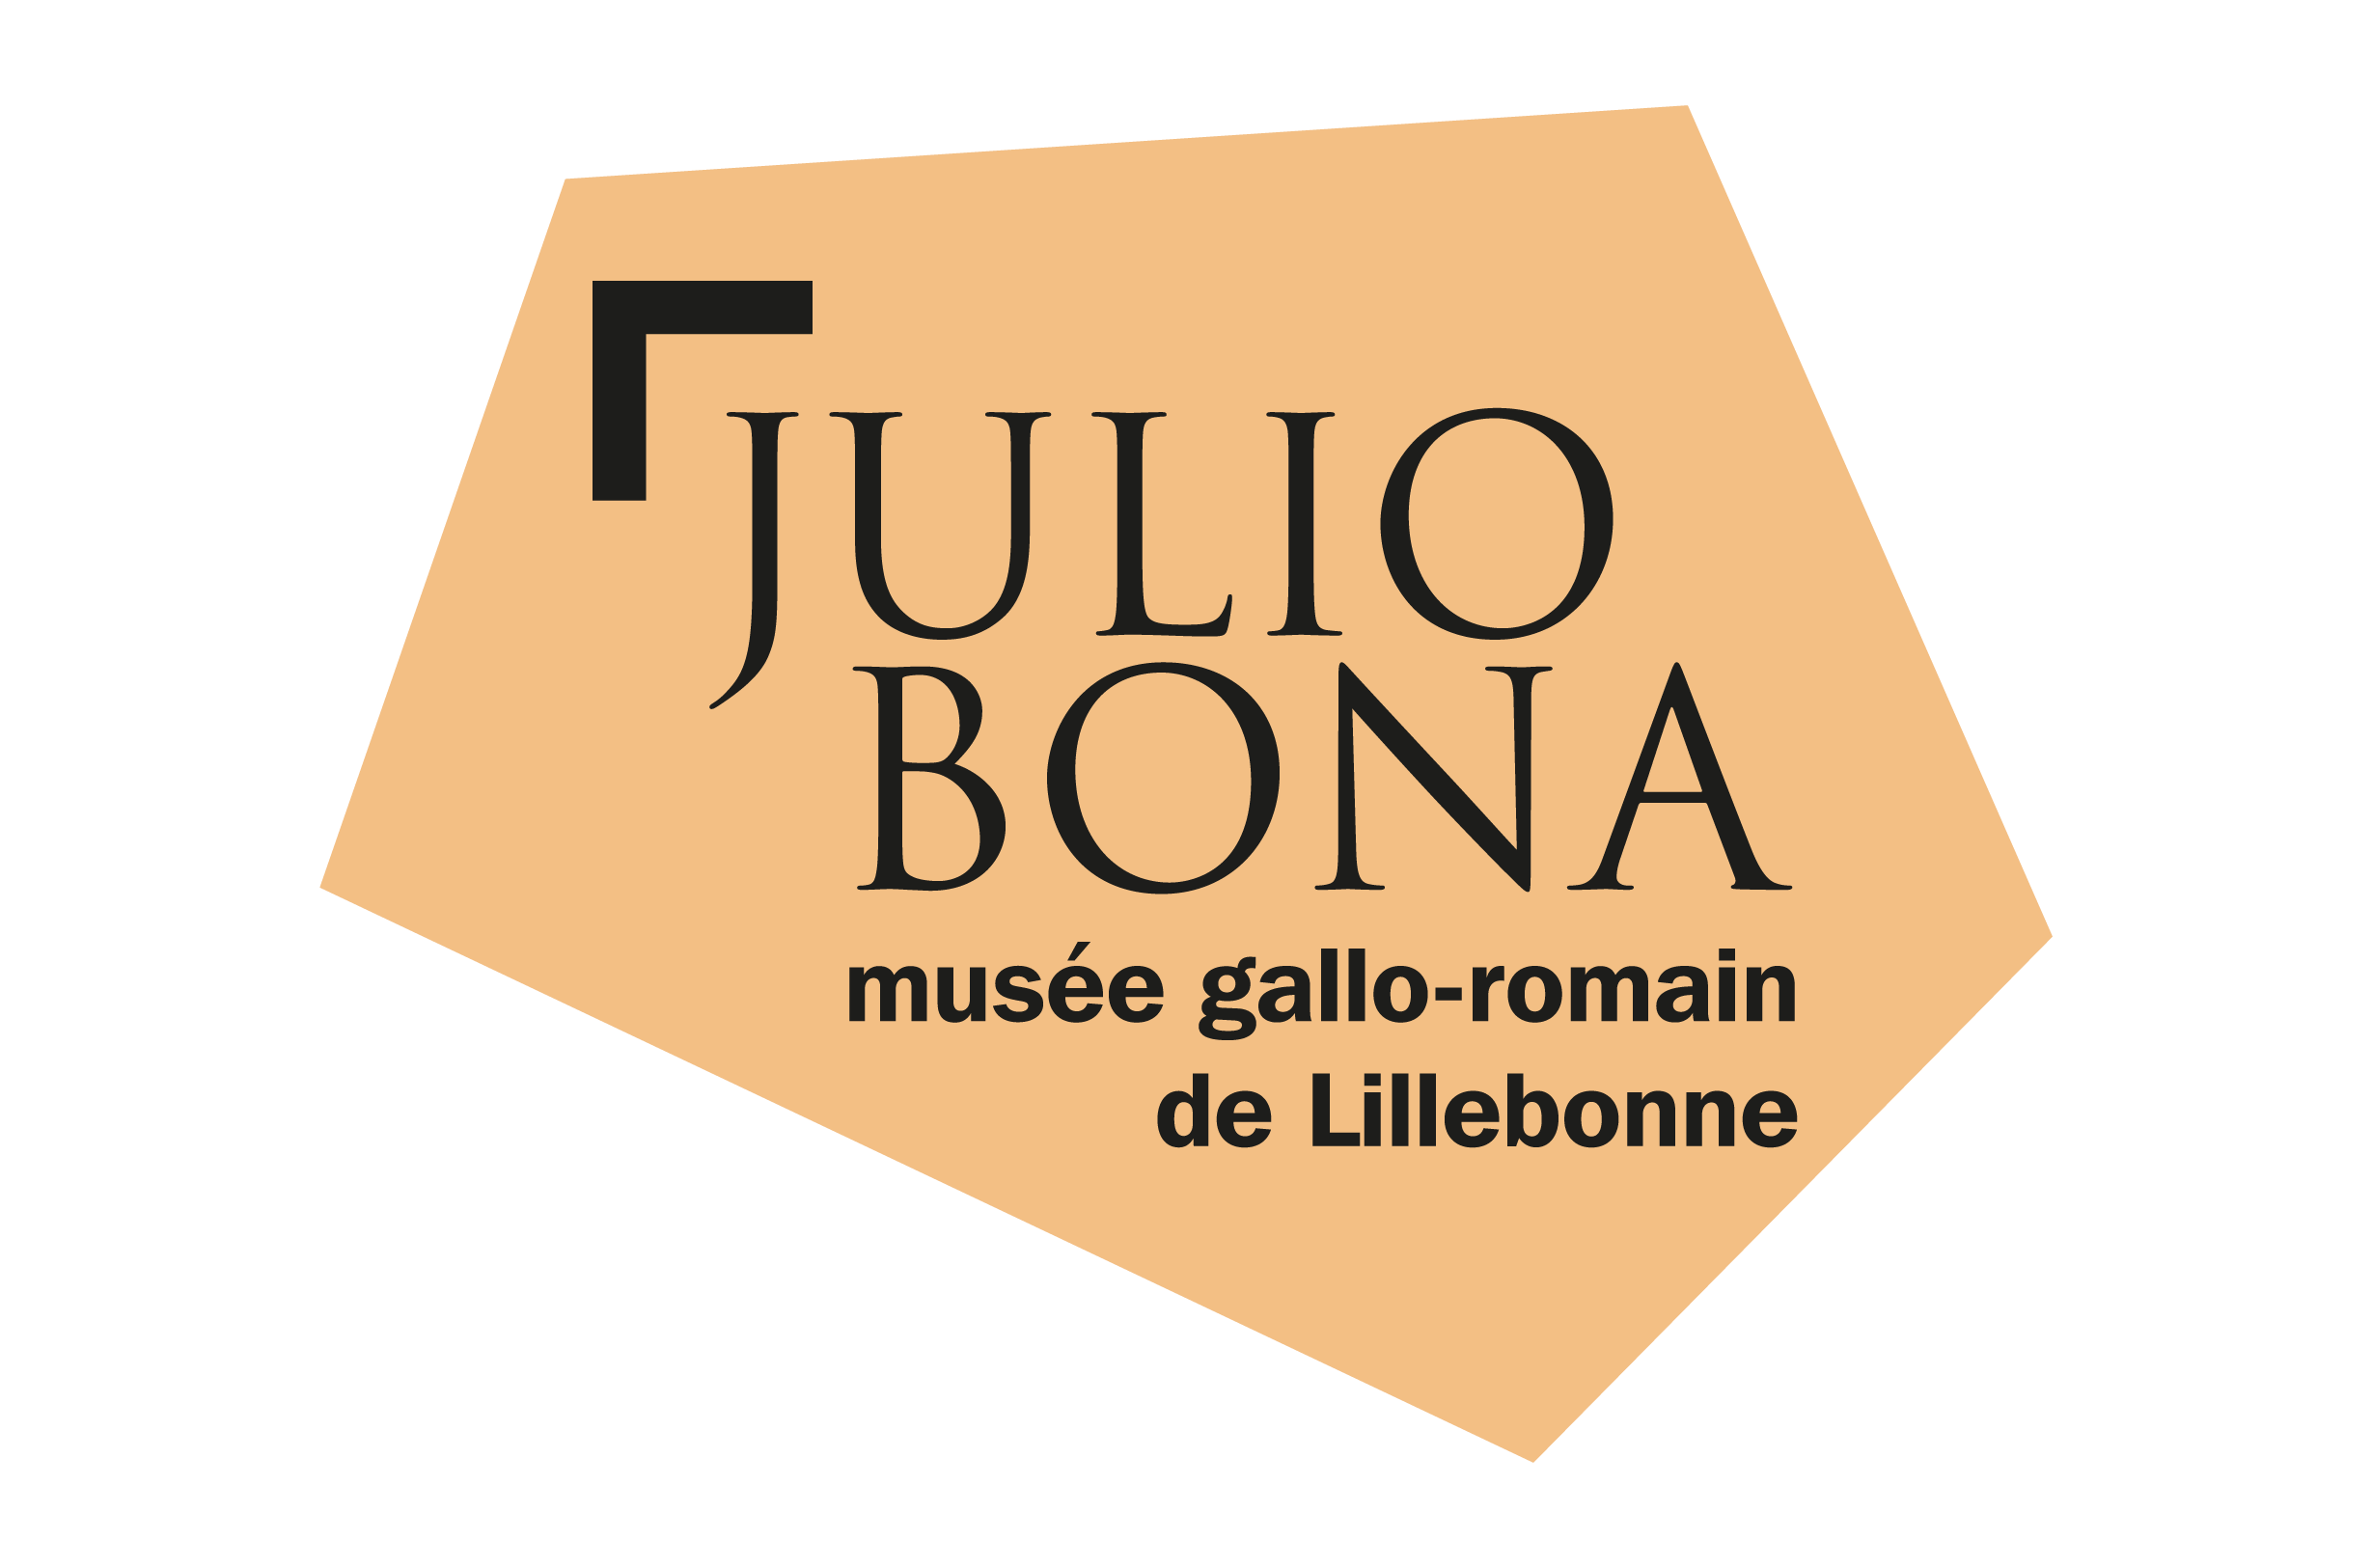 Juliobonna - Musée gallo-romain de Lillebonne